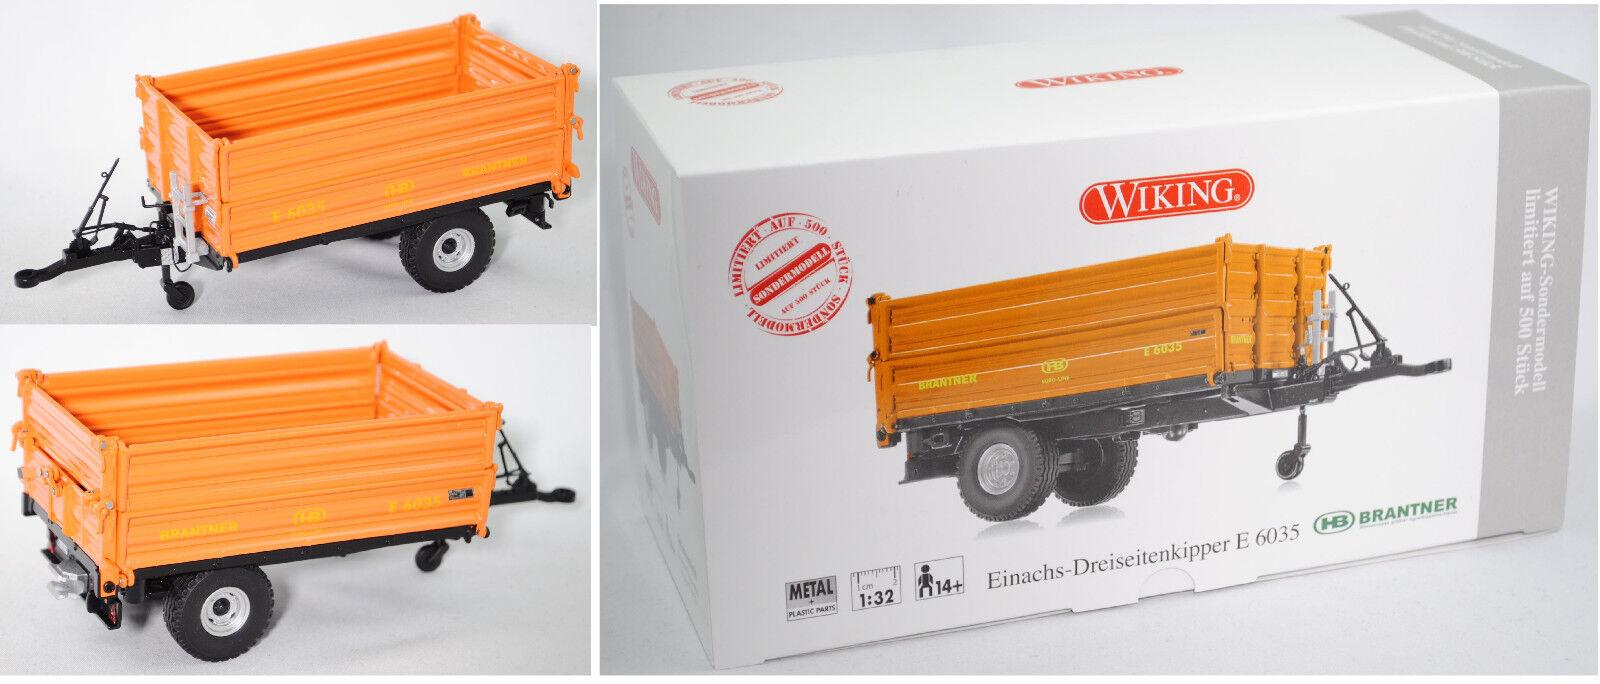 Wiking 877401 Brantner snotocukeurs-dreiseiten benne, 1 32, spécial modèle AGRITECHNICA